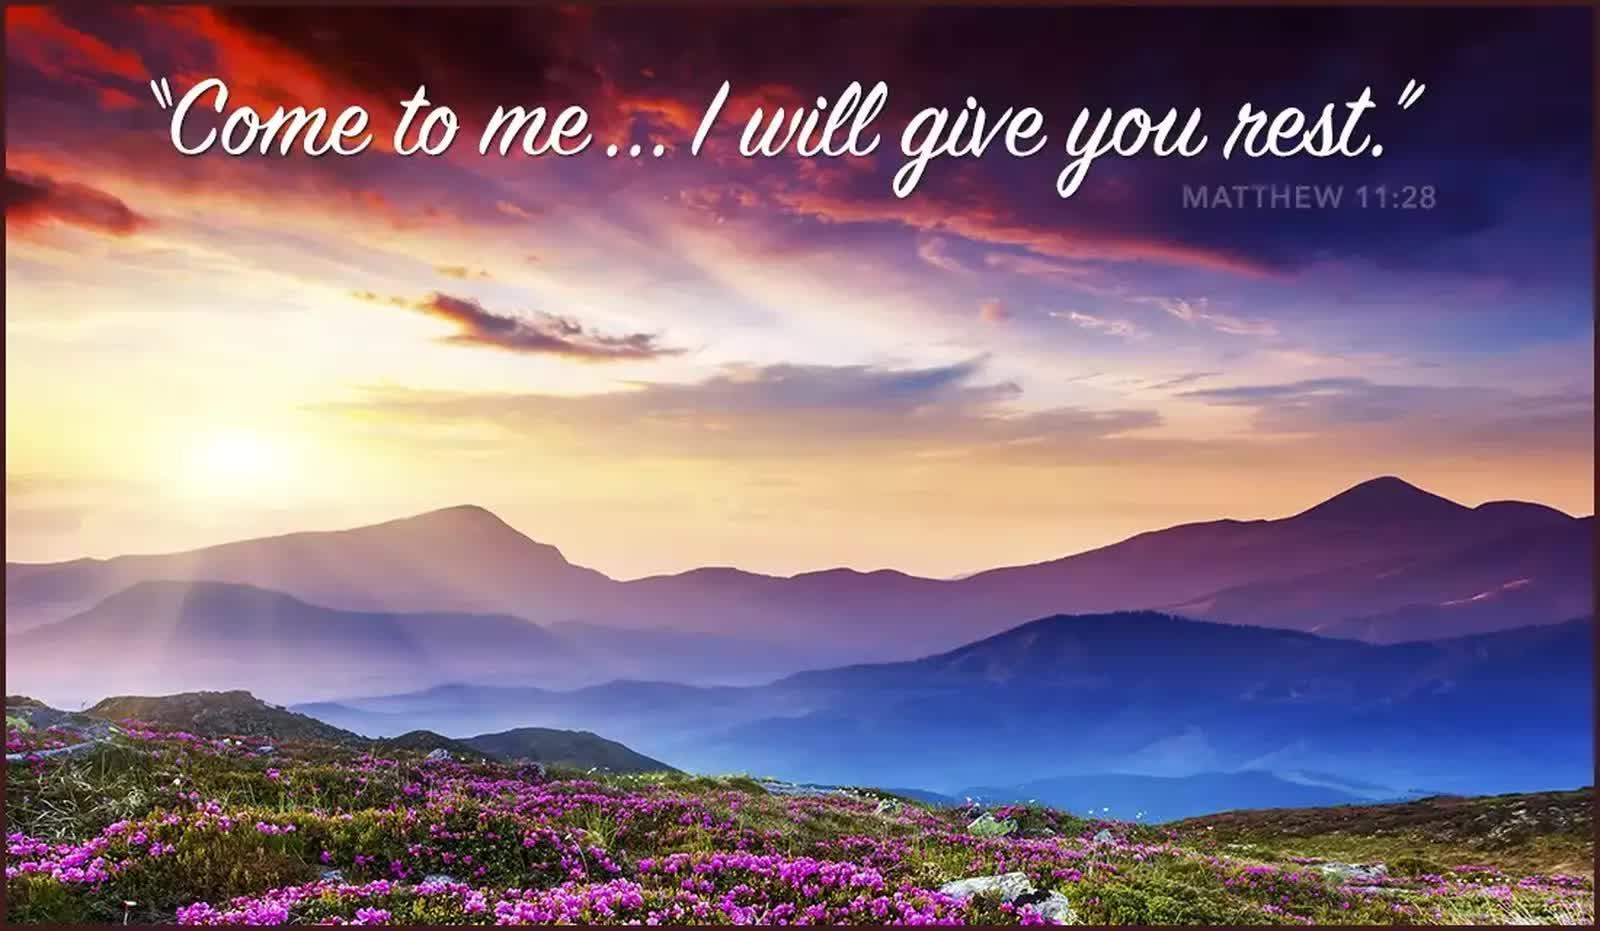 33 Top Bible Verses About Rest - Calming Scriptures